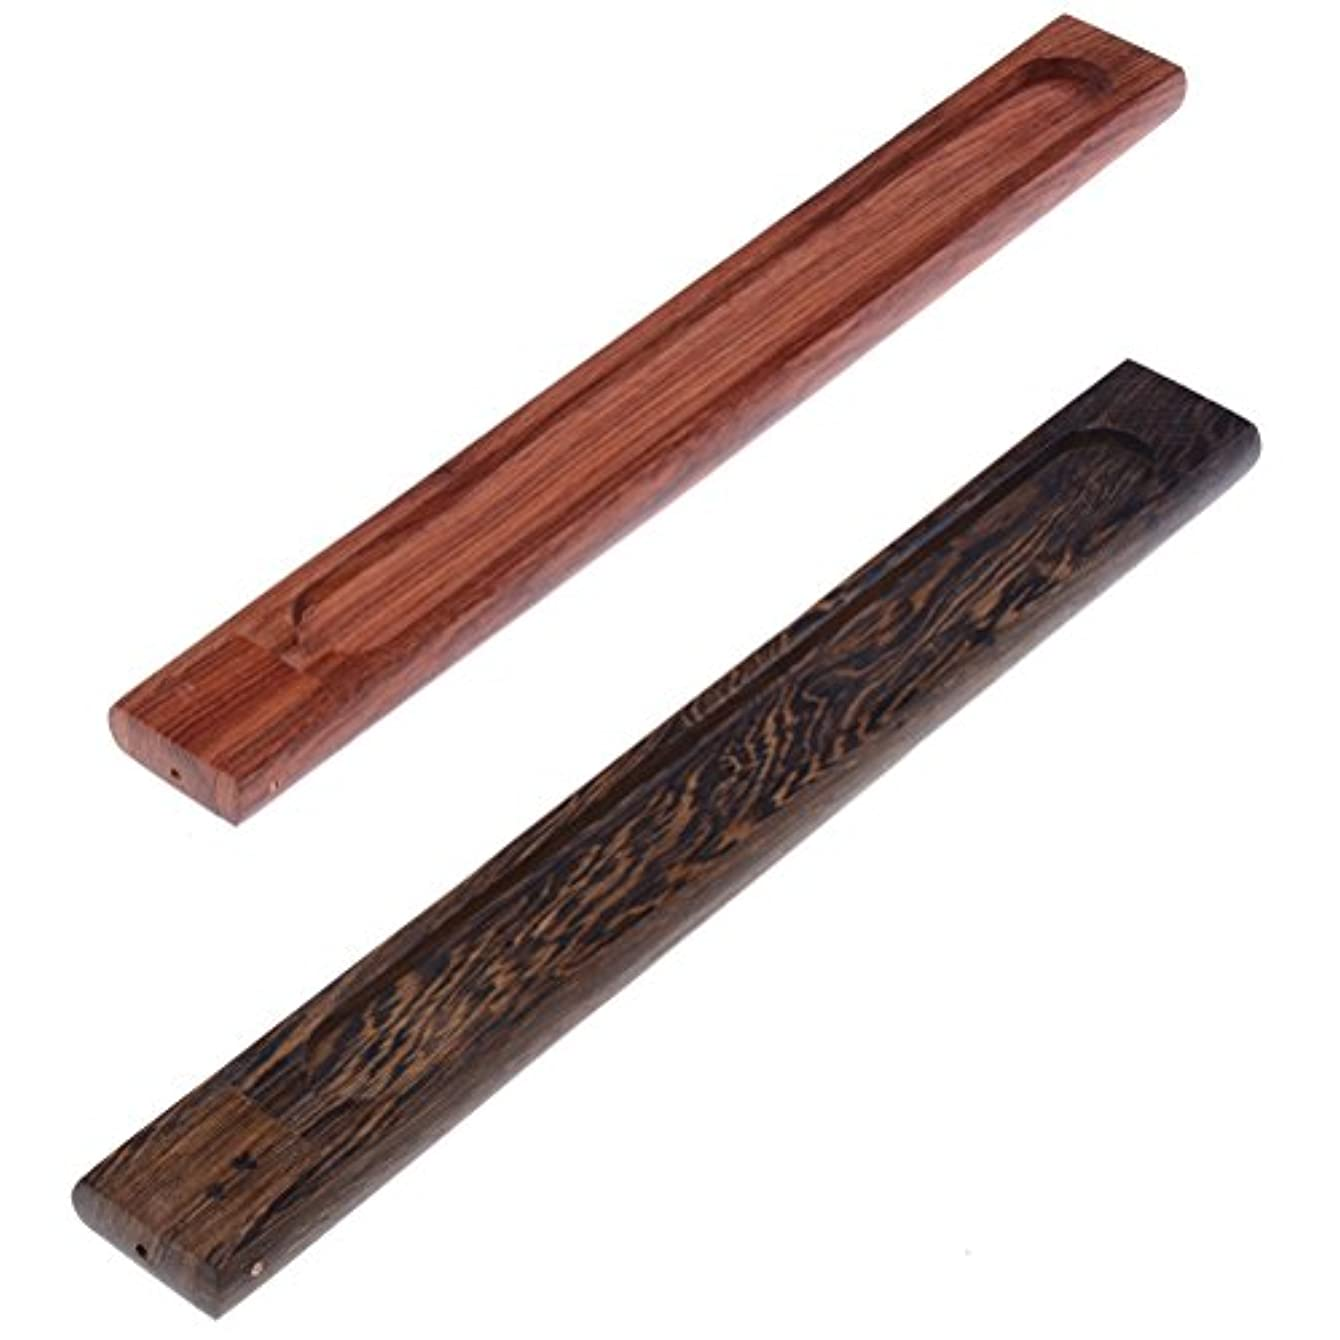 yiphates 2ピース木製香炉スティックホルダーAshキャッチャー木製トレイwith Adjustable Incense Stick Holder